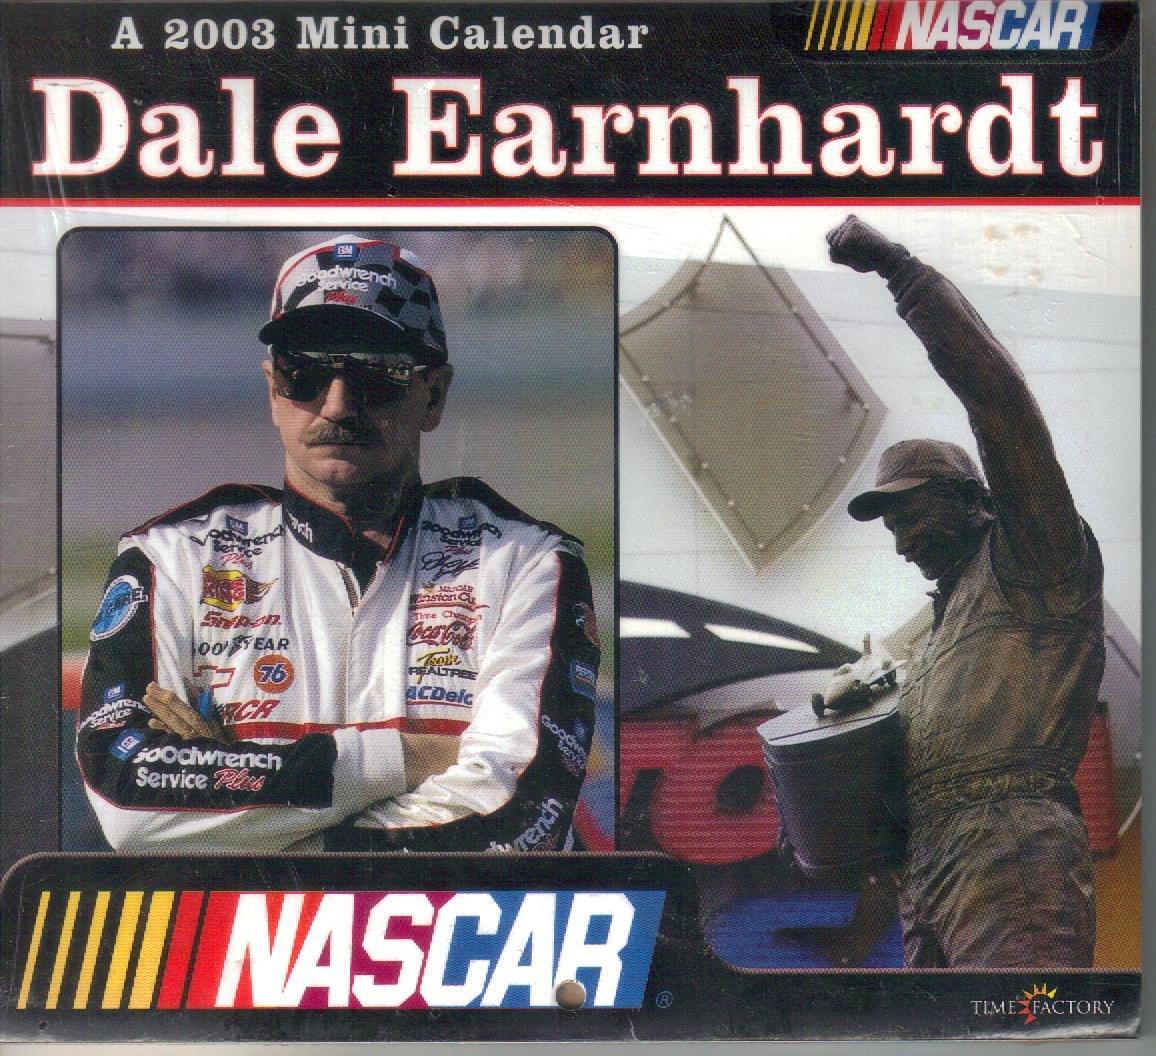 Dale Earnhardt 2003 Mini Wall Calendar NASCAR pdf